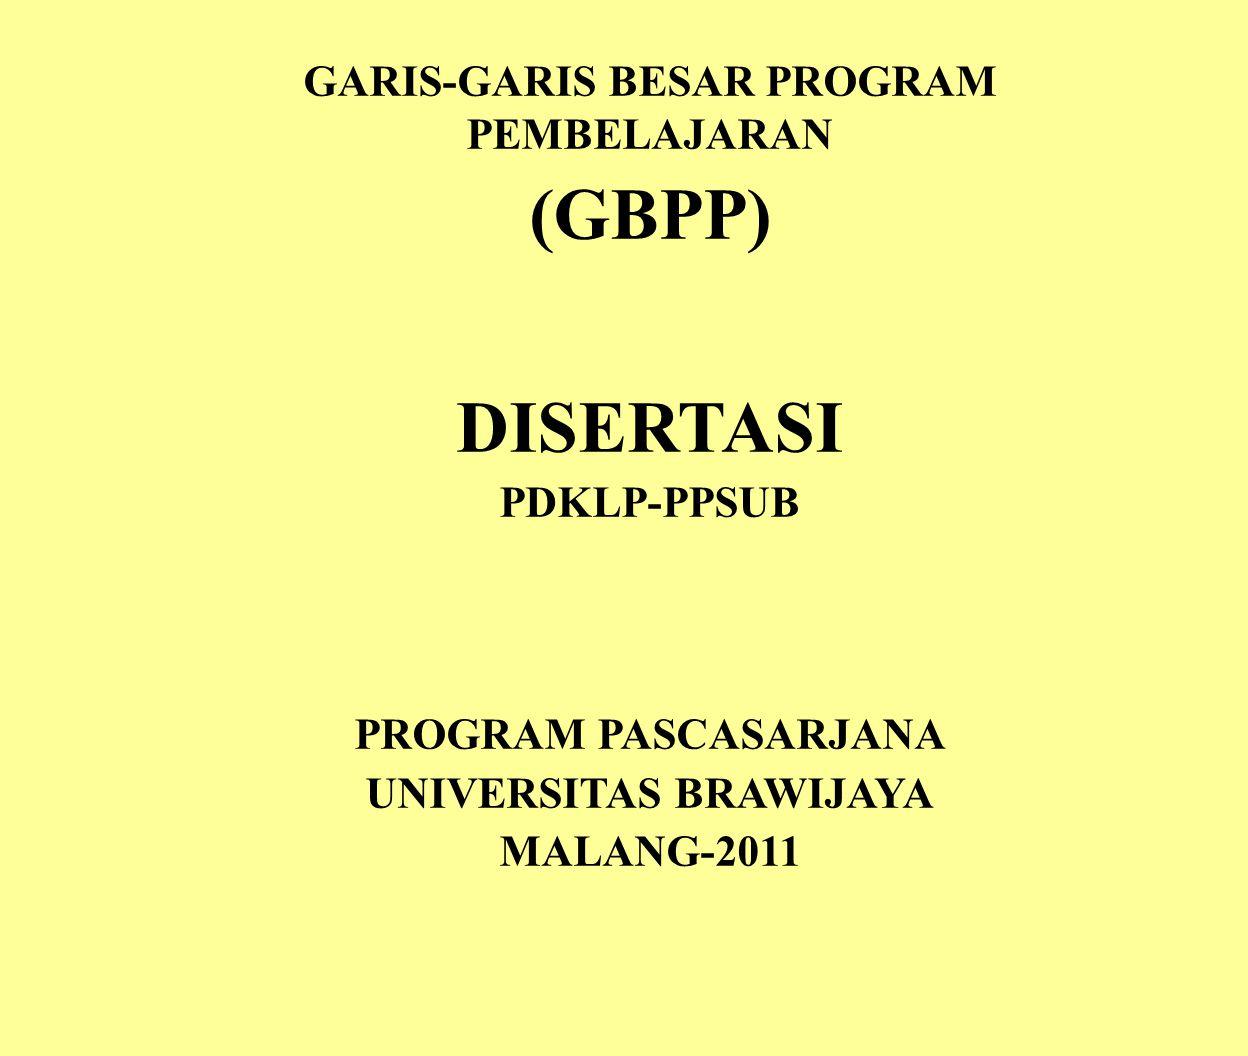 GARIS-GARIS BESAR PROGRAM PEMBELAJARAN UNIVERSITAS BRAWIJAYA